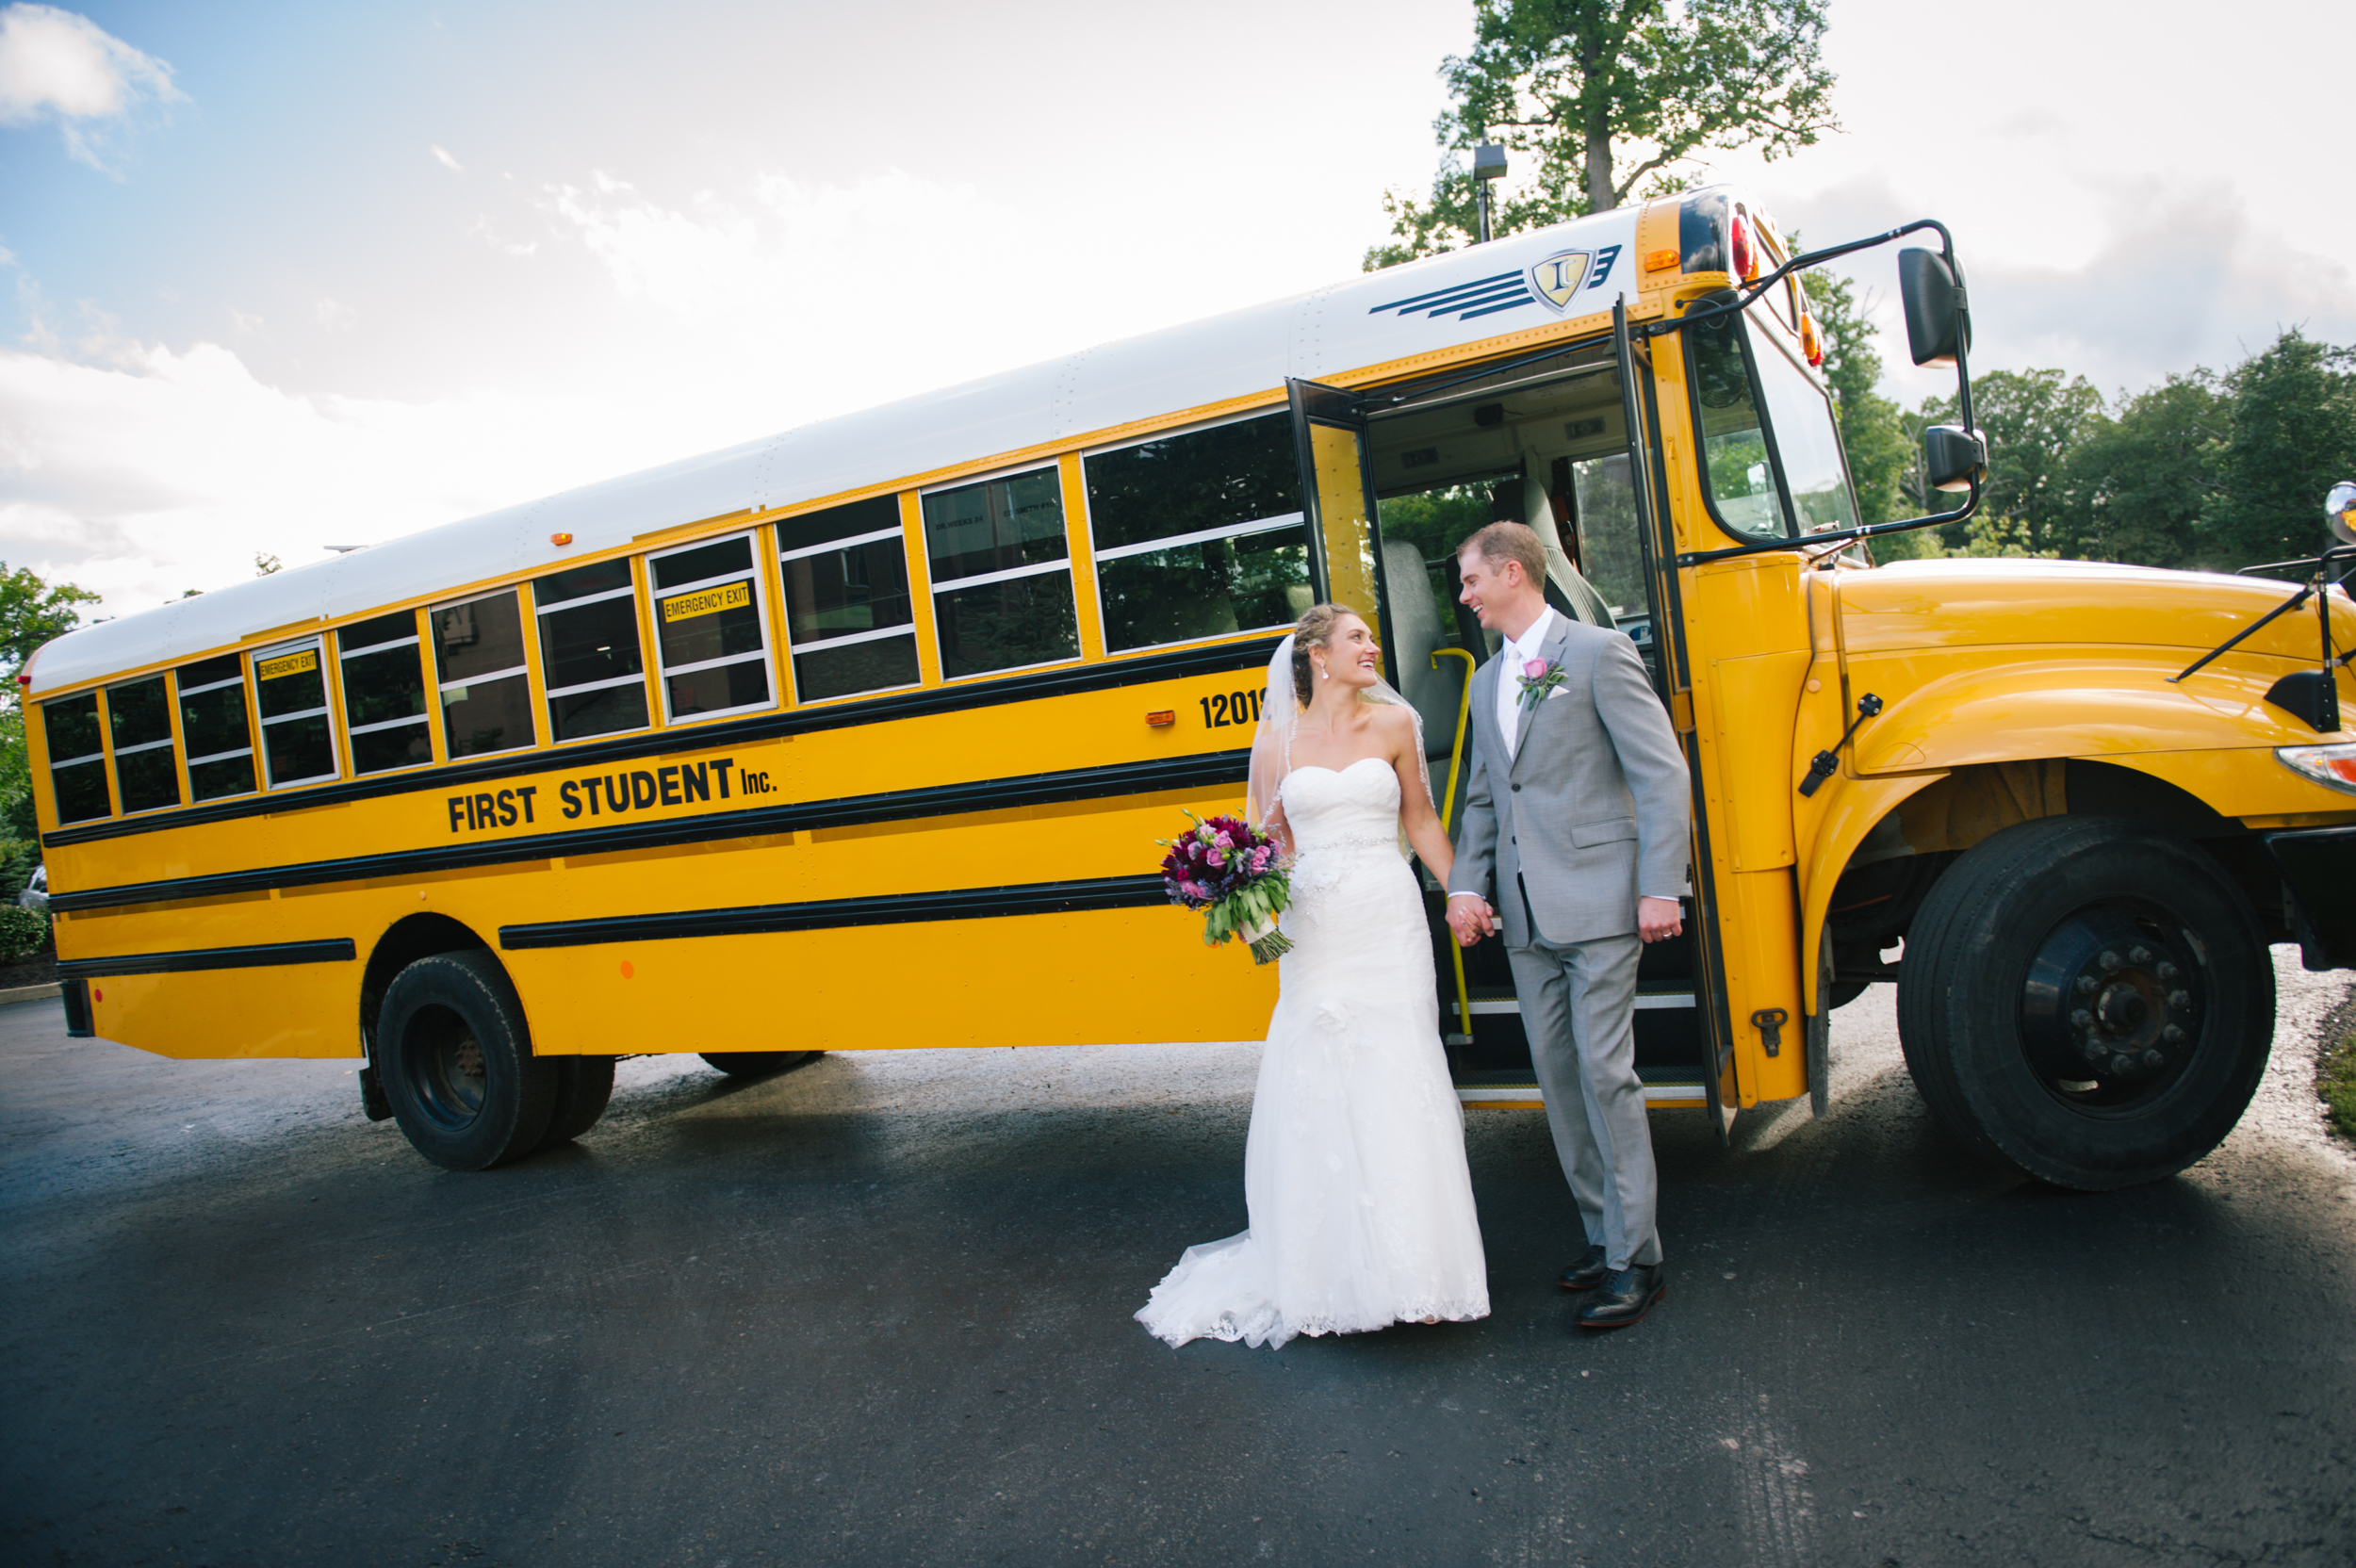 JKP-Destination-Weddings-0070.JPG